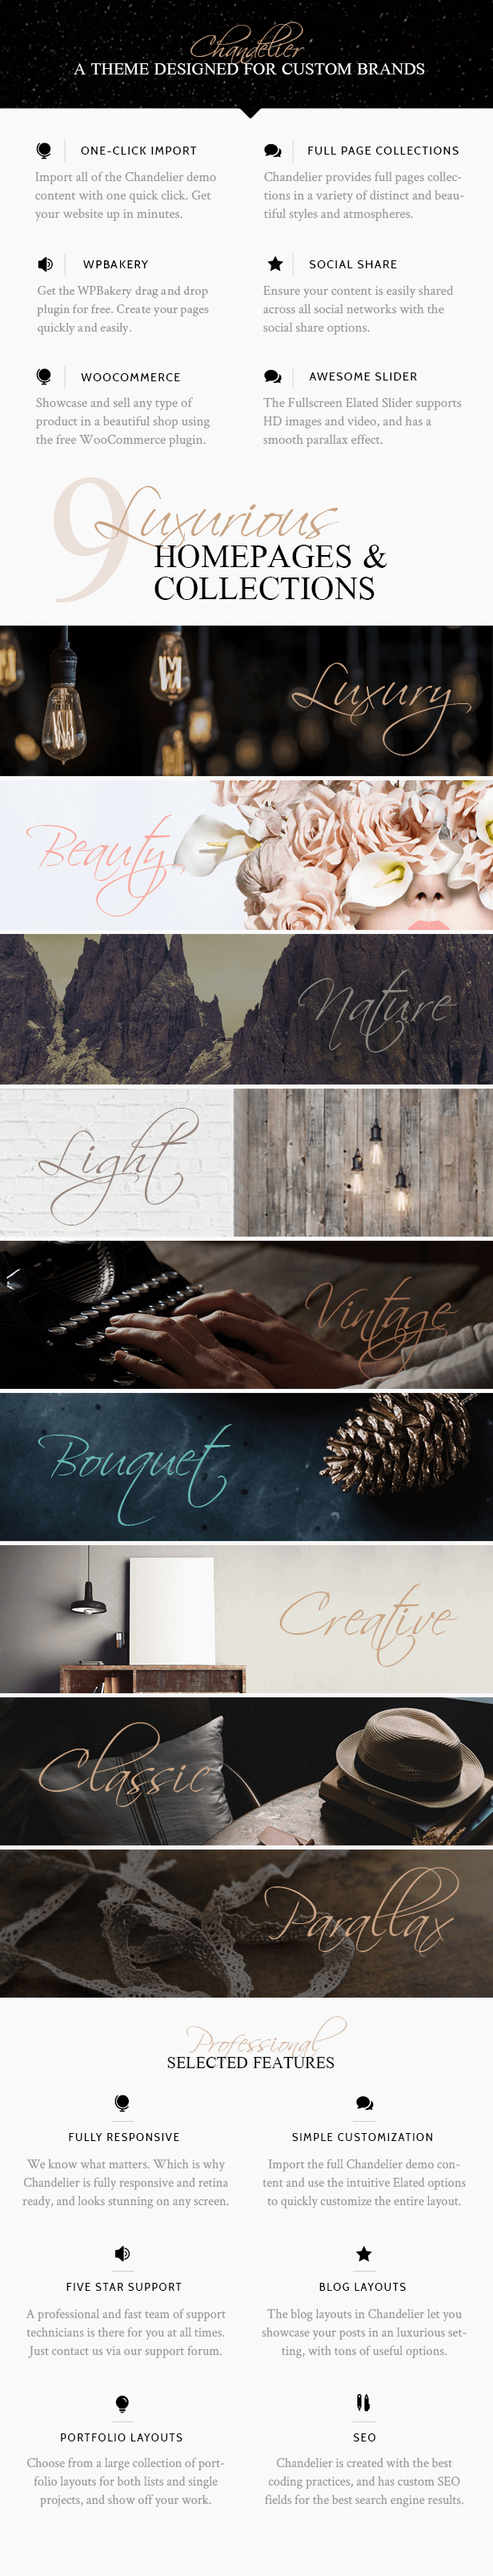 Chandelier - Luxury Theme for Custom Brands - 1